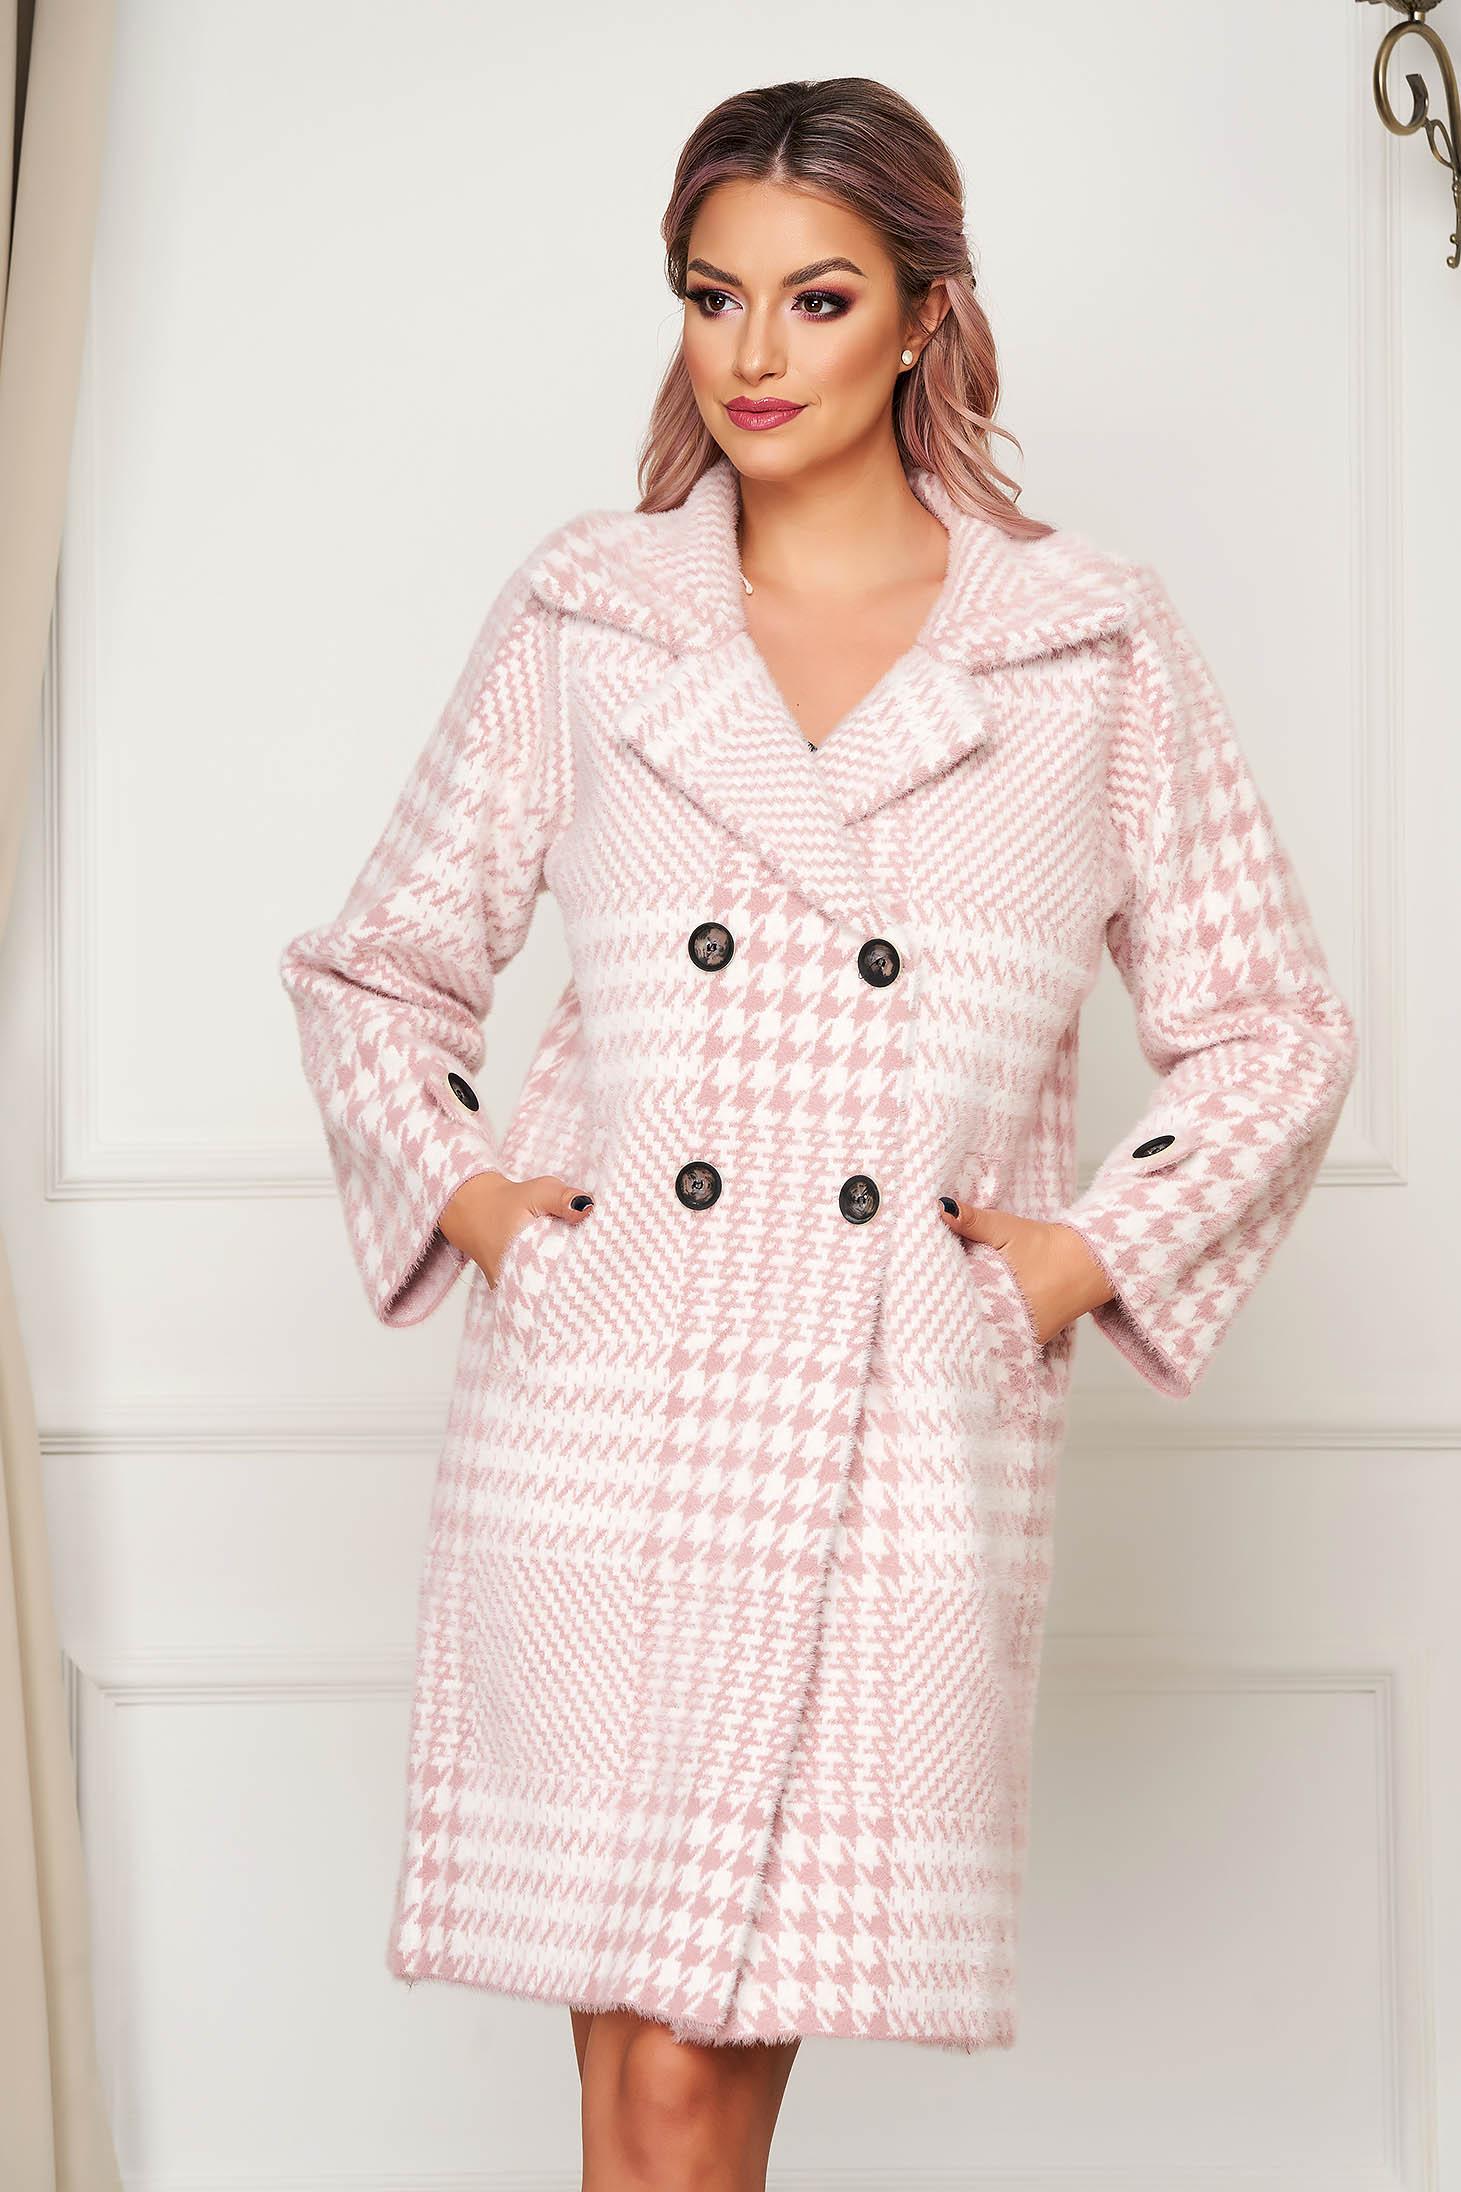 Palton SunShine roz elegant din lana cu croi larg in carouri